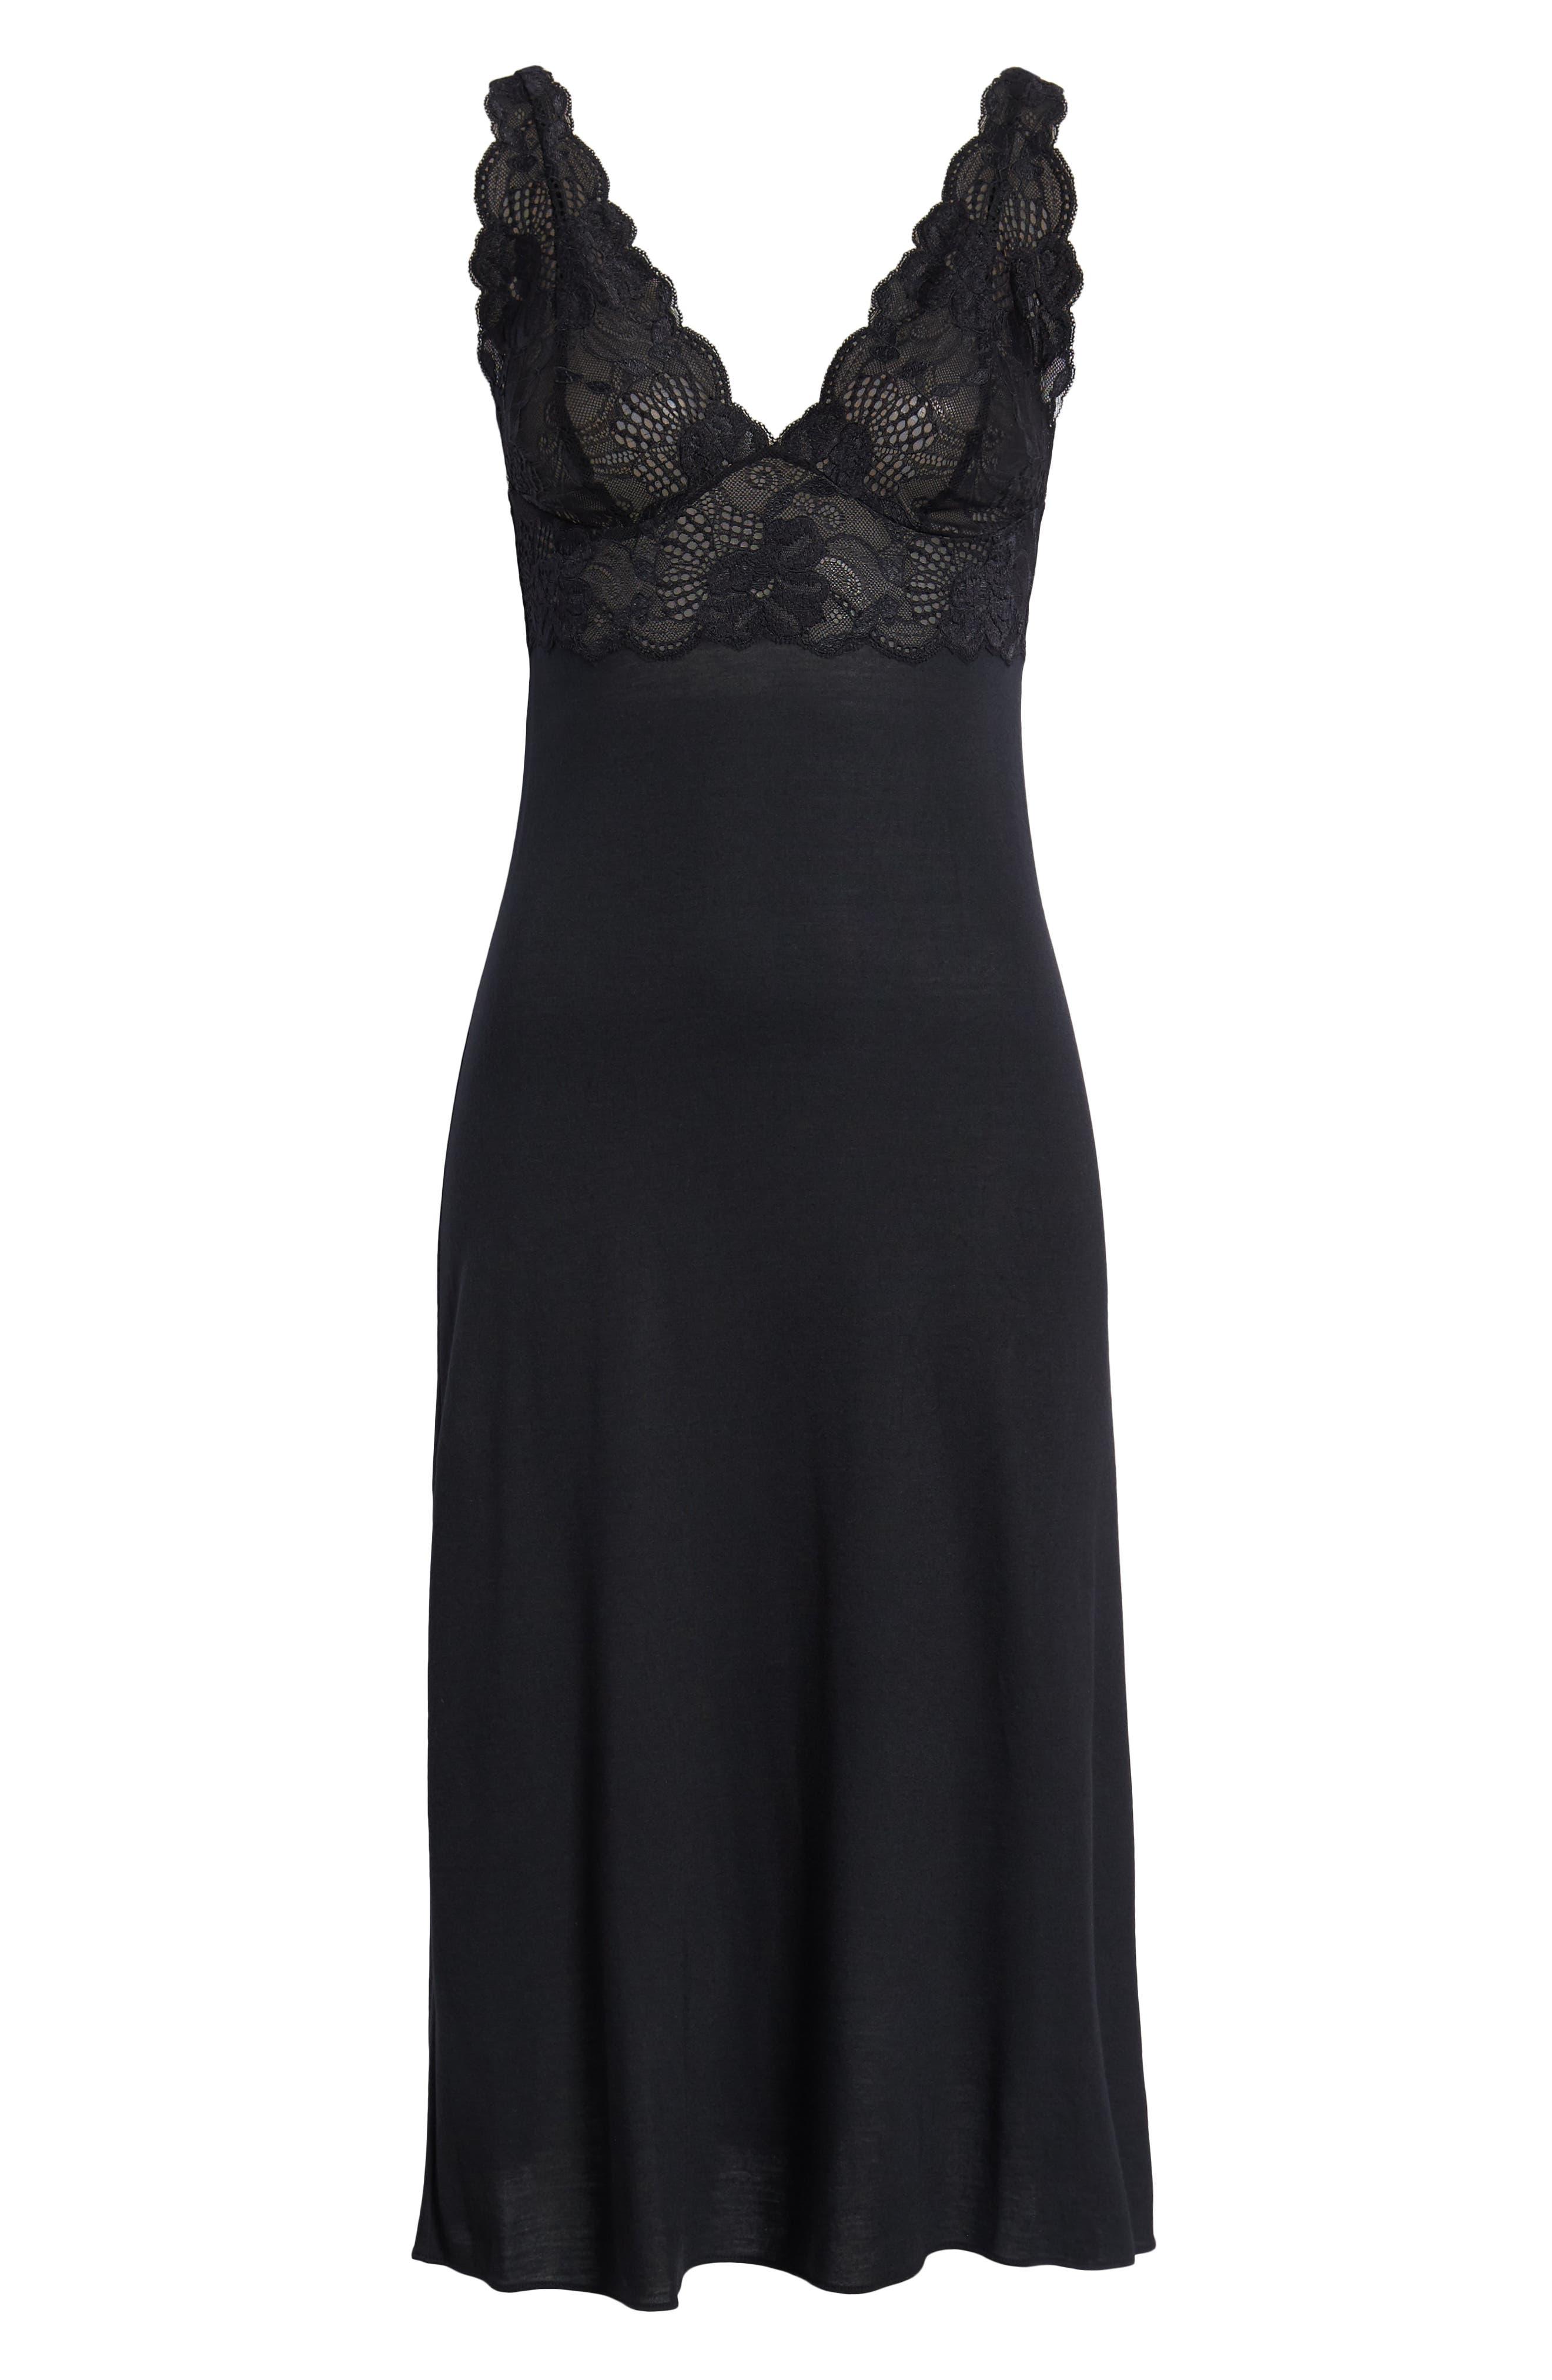 NATORI, 'Zen Floral' Nightgown, Alternate thumbnail 2, color, BLACK